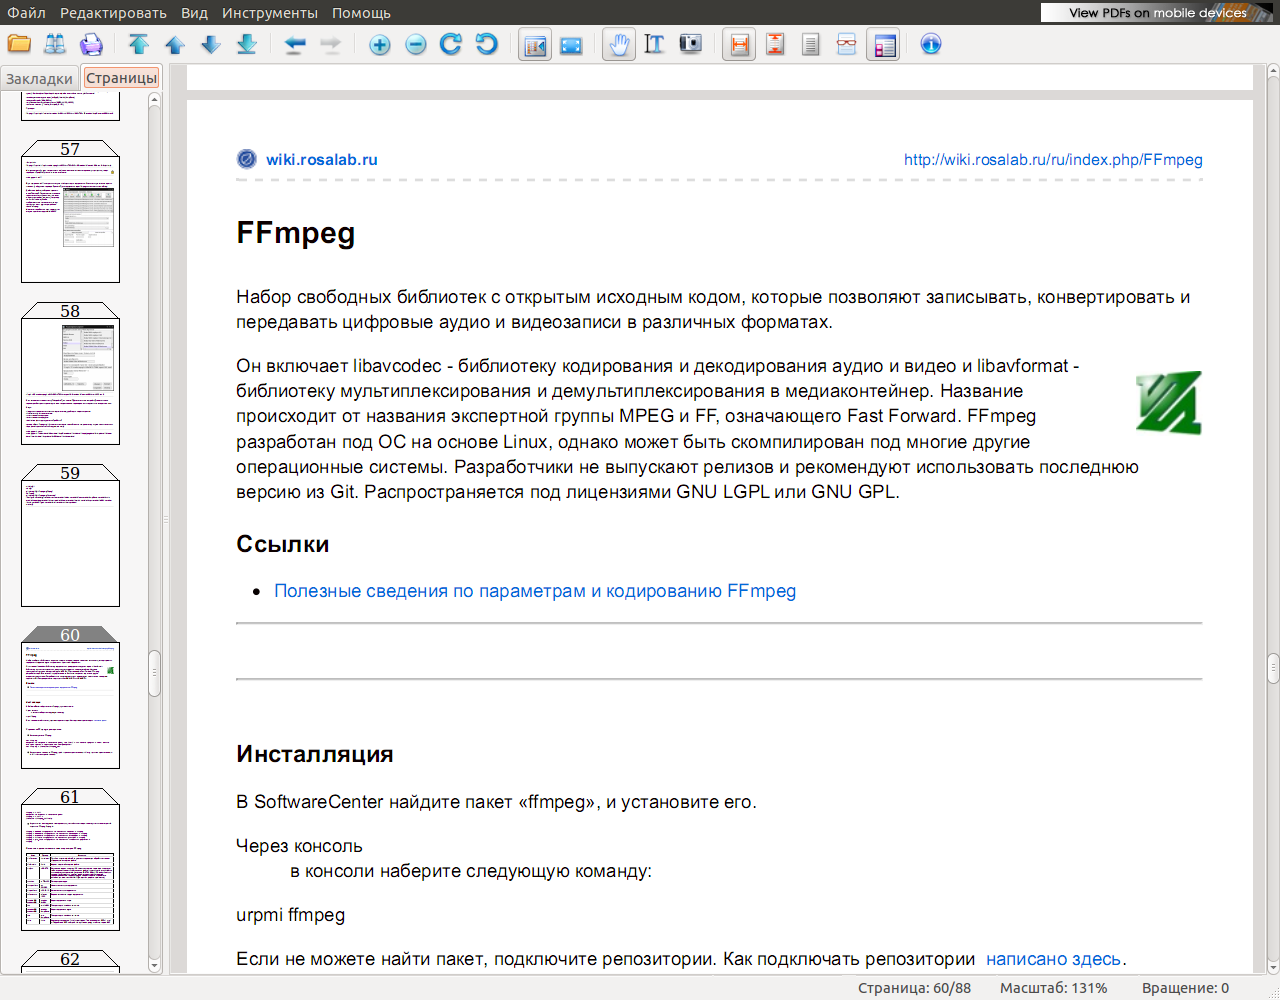 [ffmpeg.pdf] - Foxit Reader 1.1_316